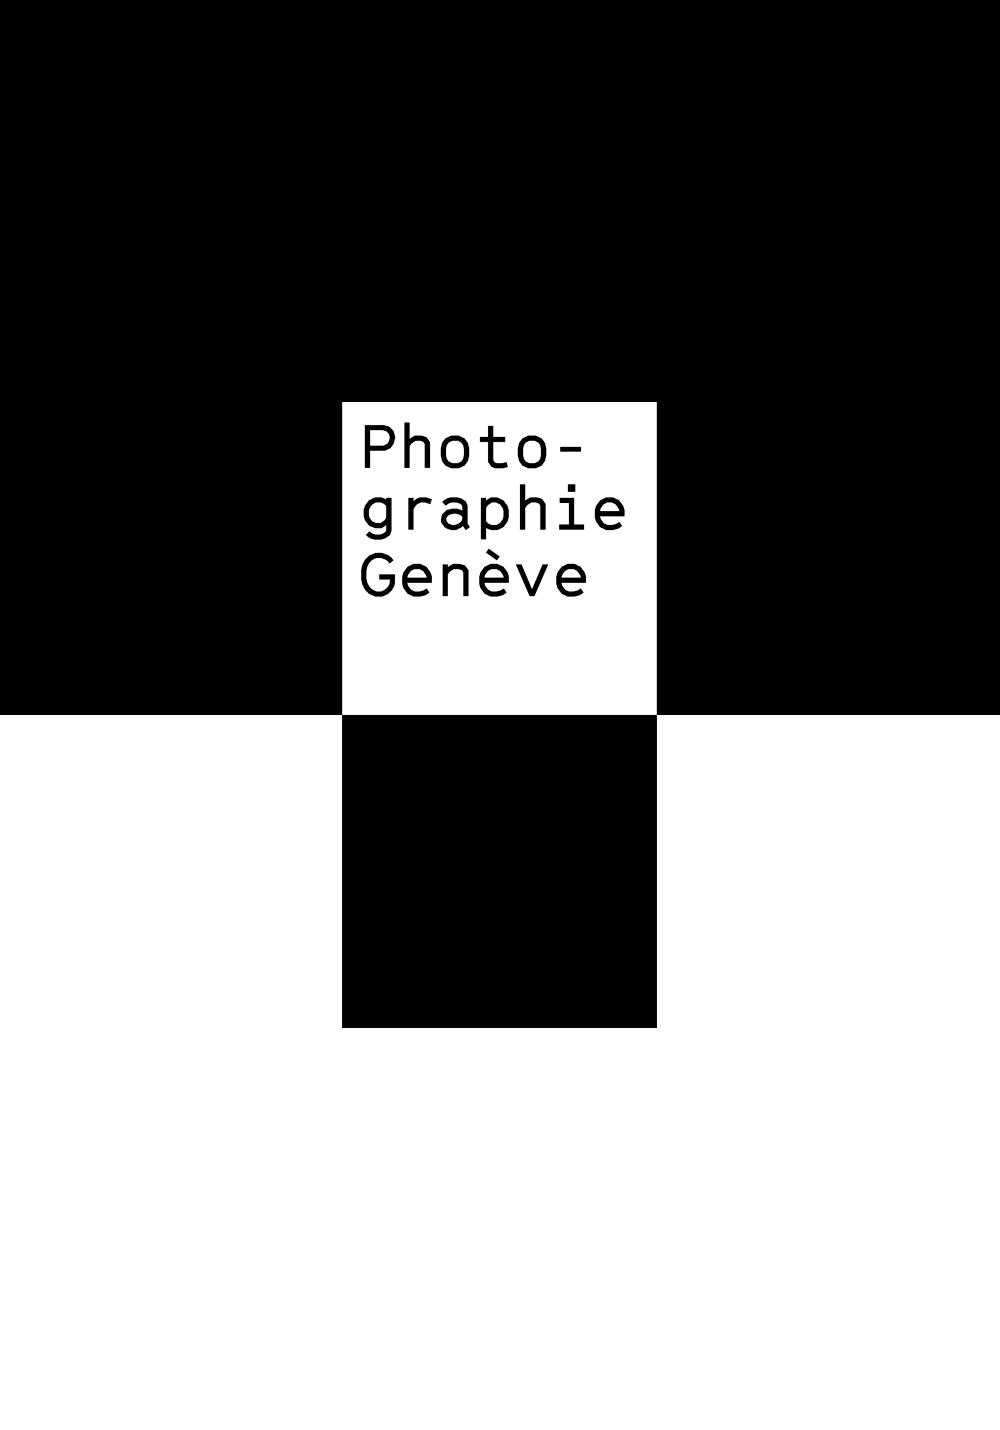 Photographie Genève